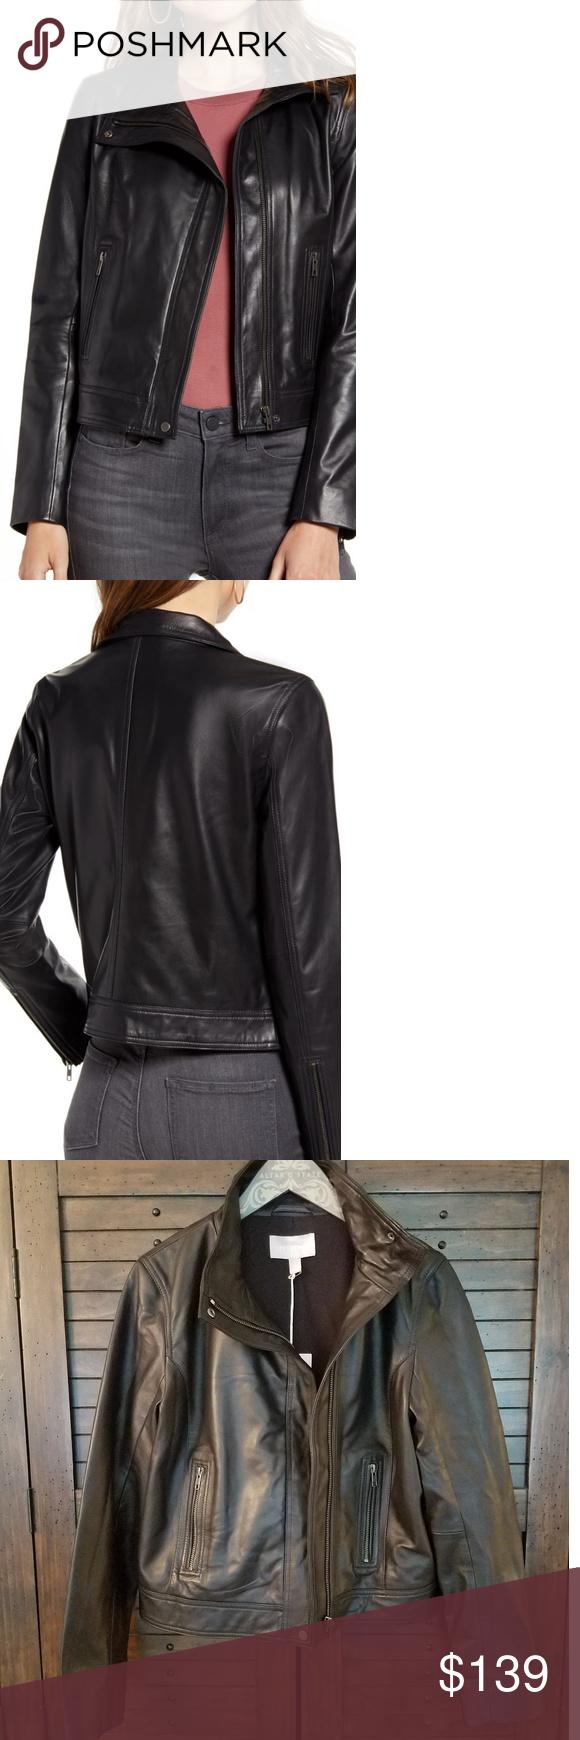 Cheslsea28 Black Leather Jacket Leather Jacket Black Leather Jacket Black Leather [ 1740 x 580 Pixel ]